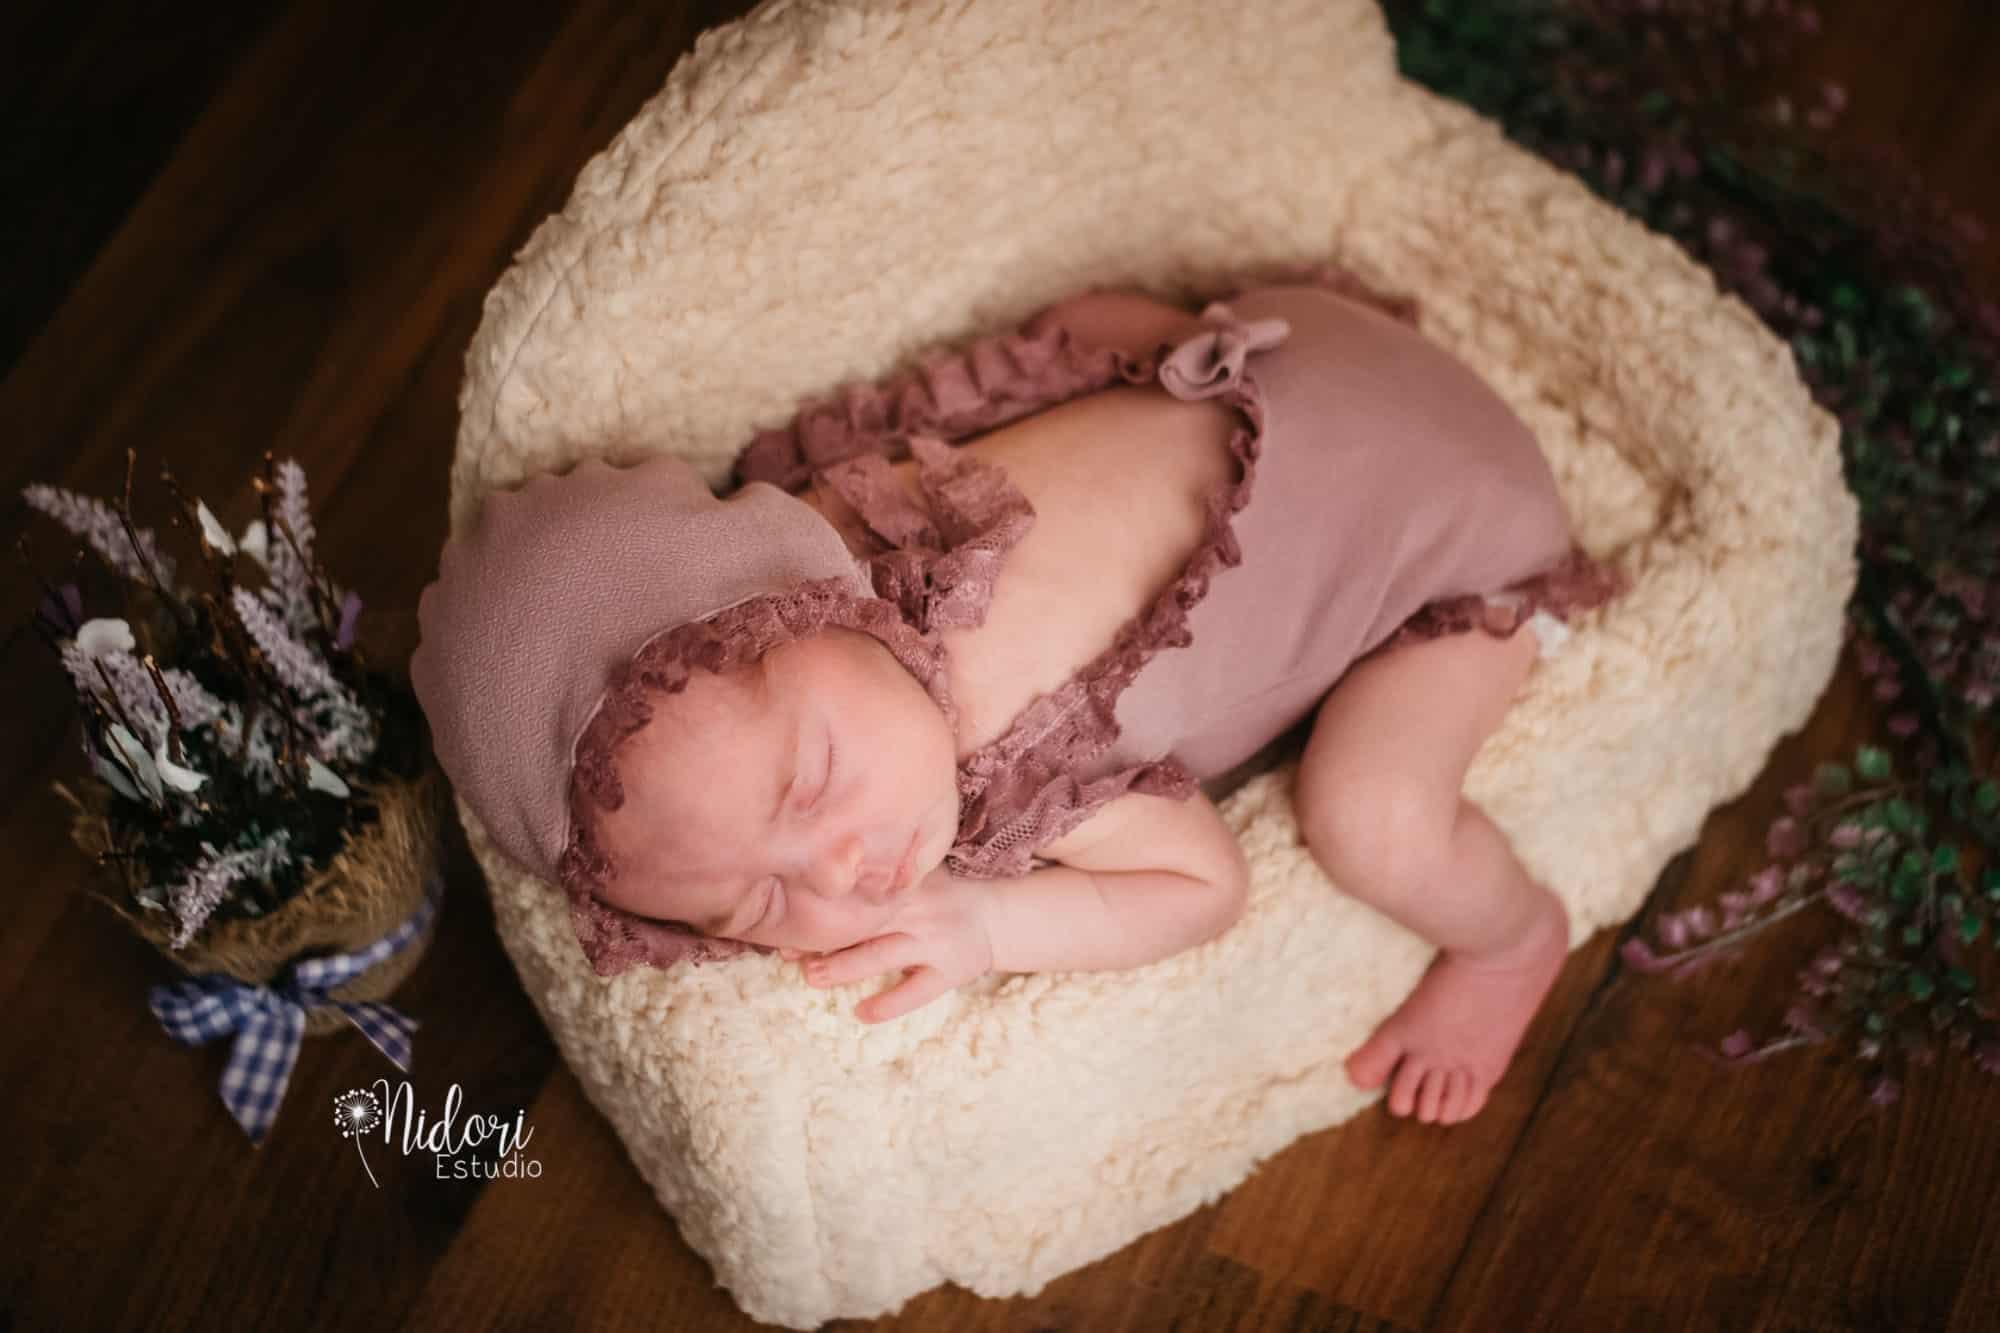 fotosbebe-fotografia-recien-nacido-newborn-bebes-nidoriestudio-fotos-valencia-almazora-castellon-españa-spain-18